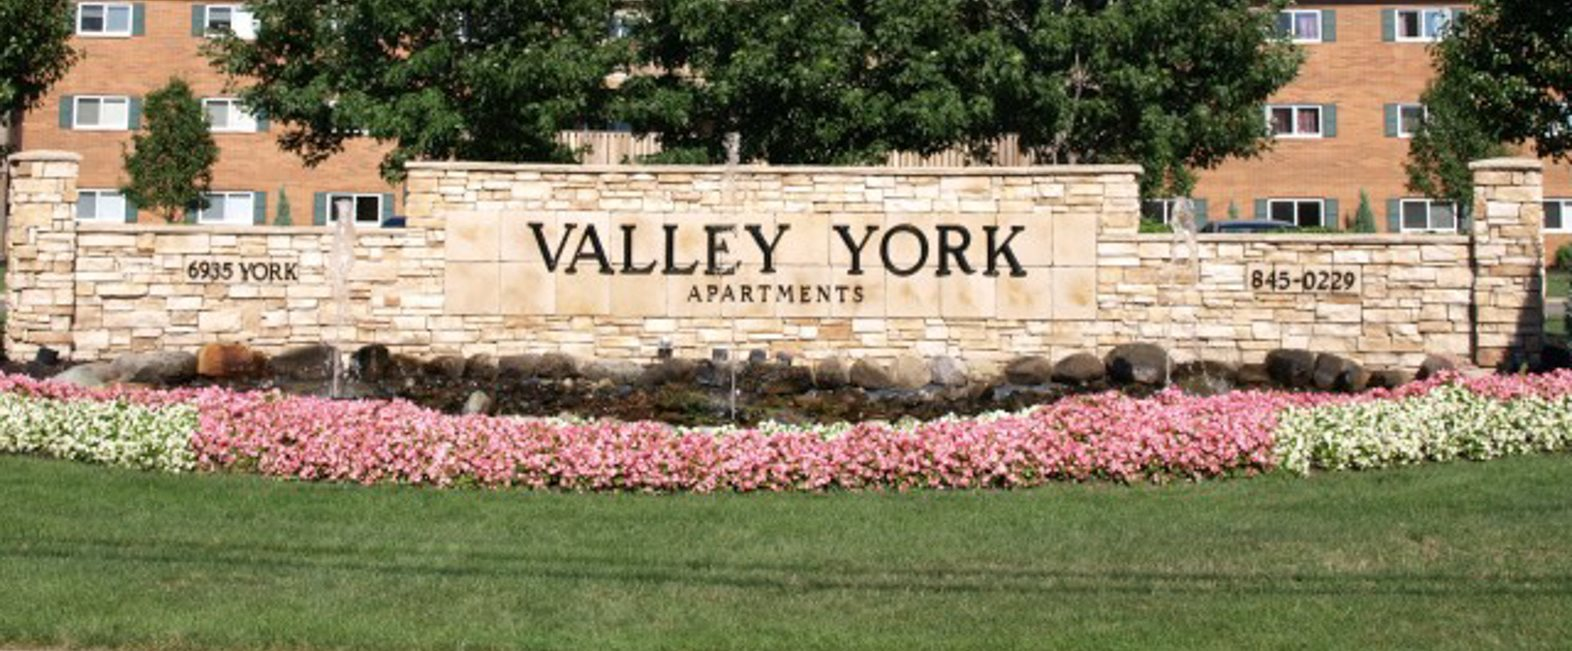 Valley York Sign